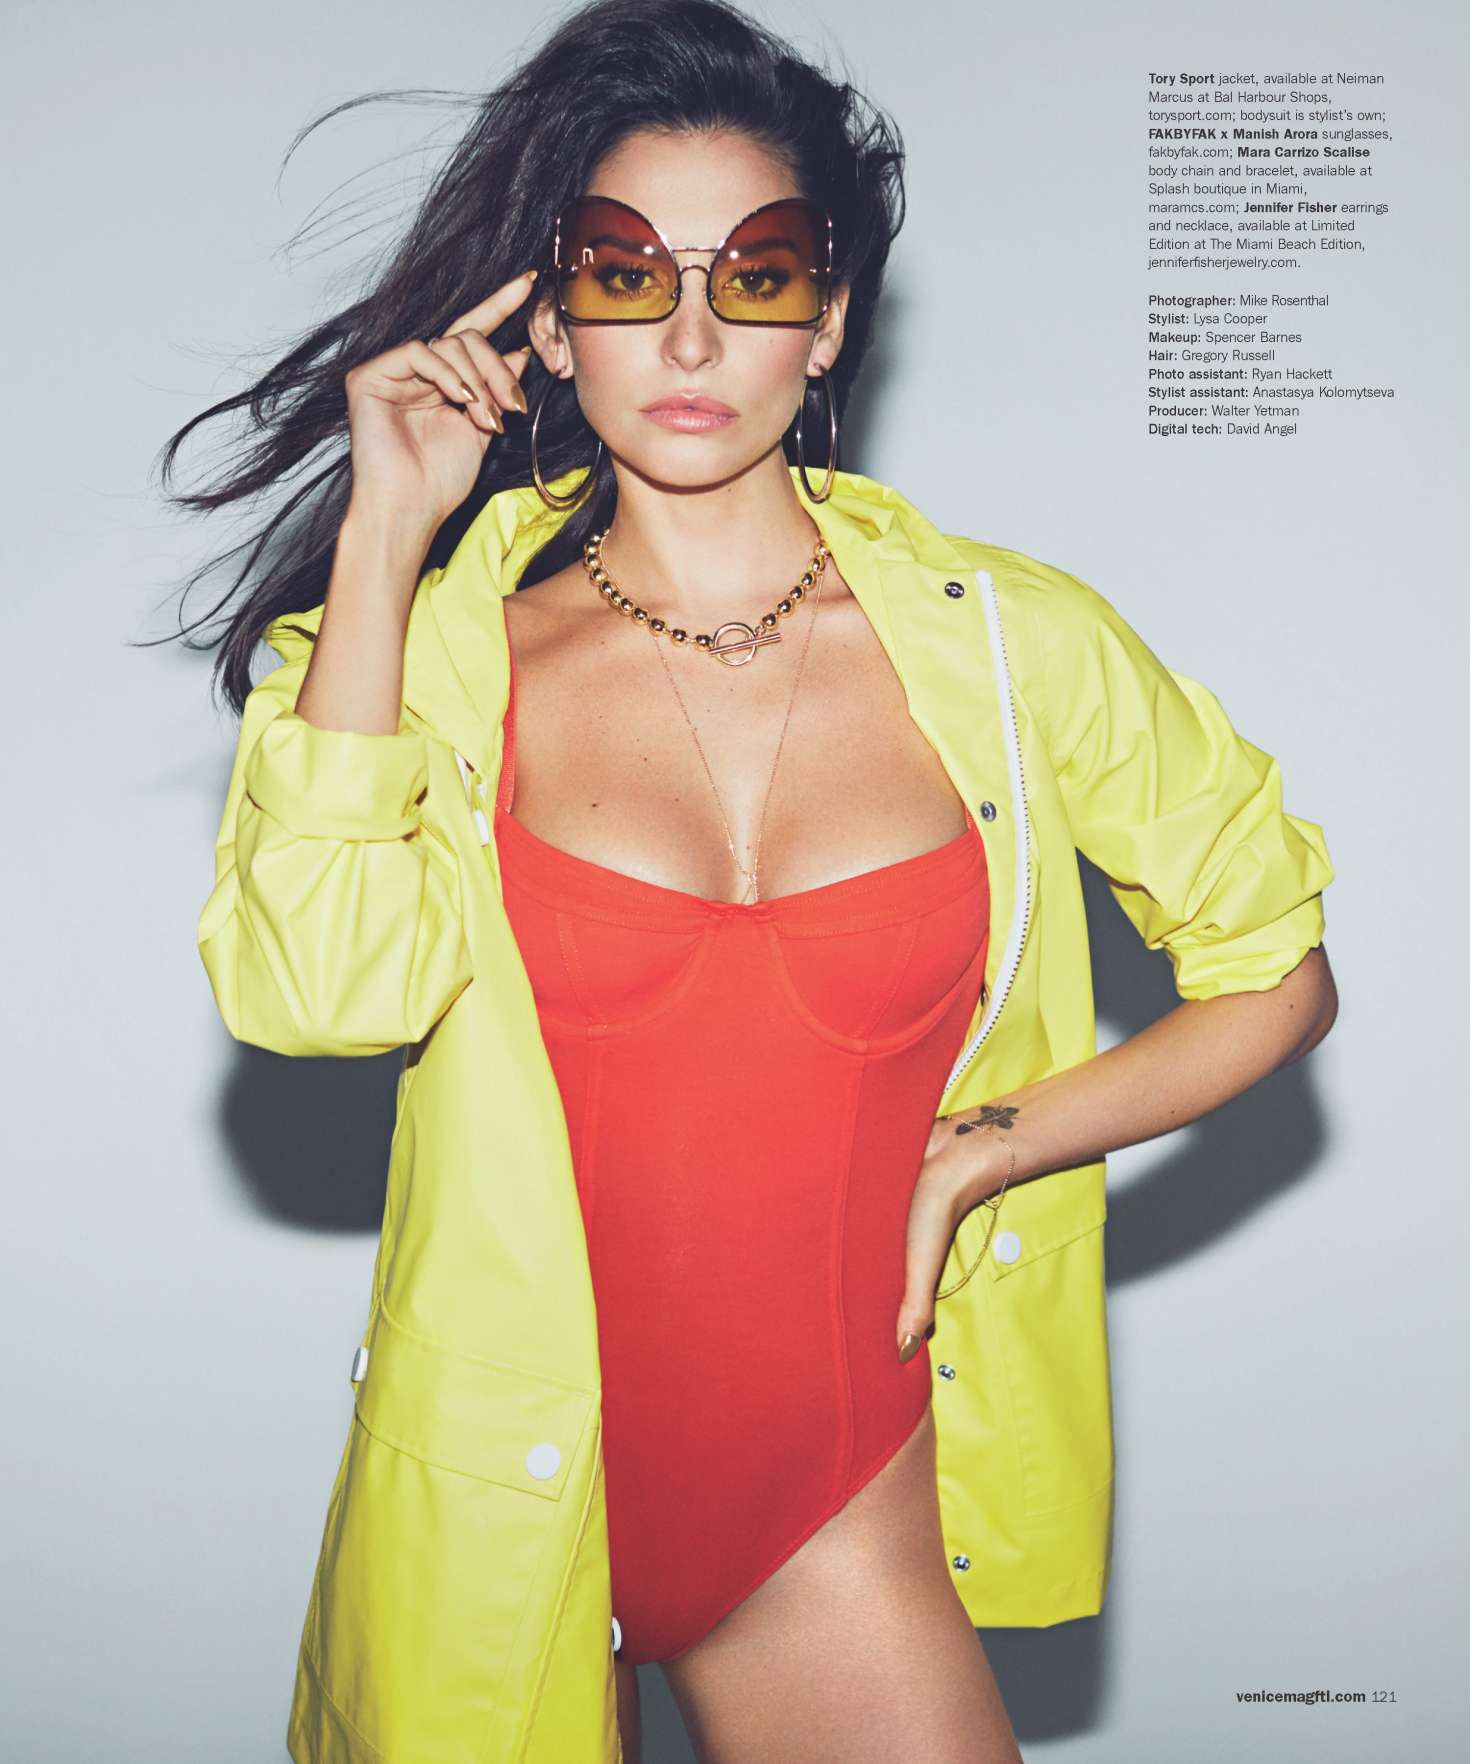 Genesis Rodriguez – Venice Magazine (Spring 2017)